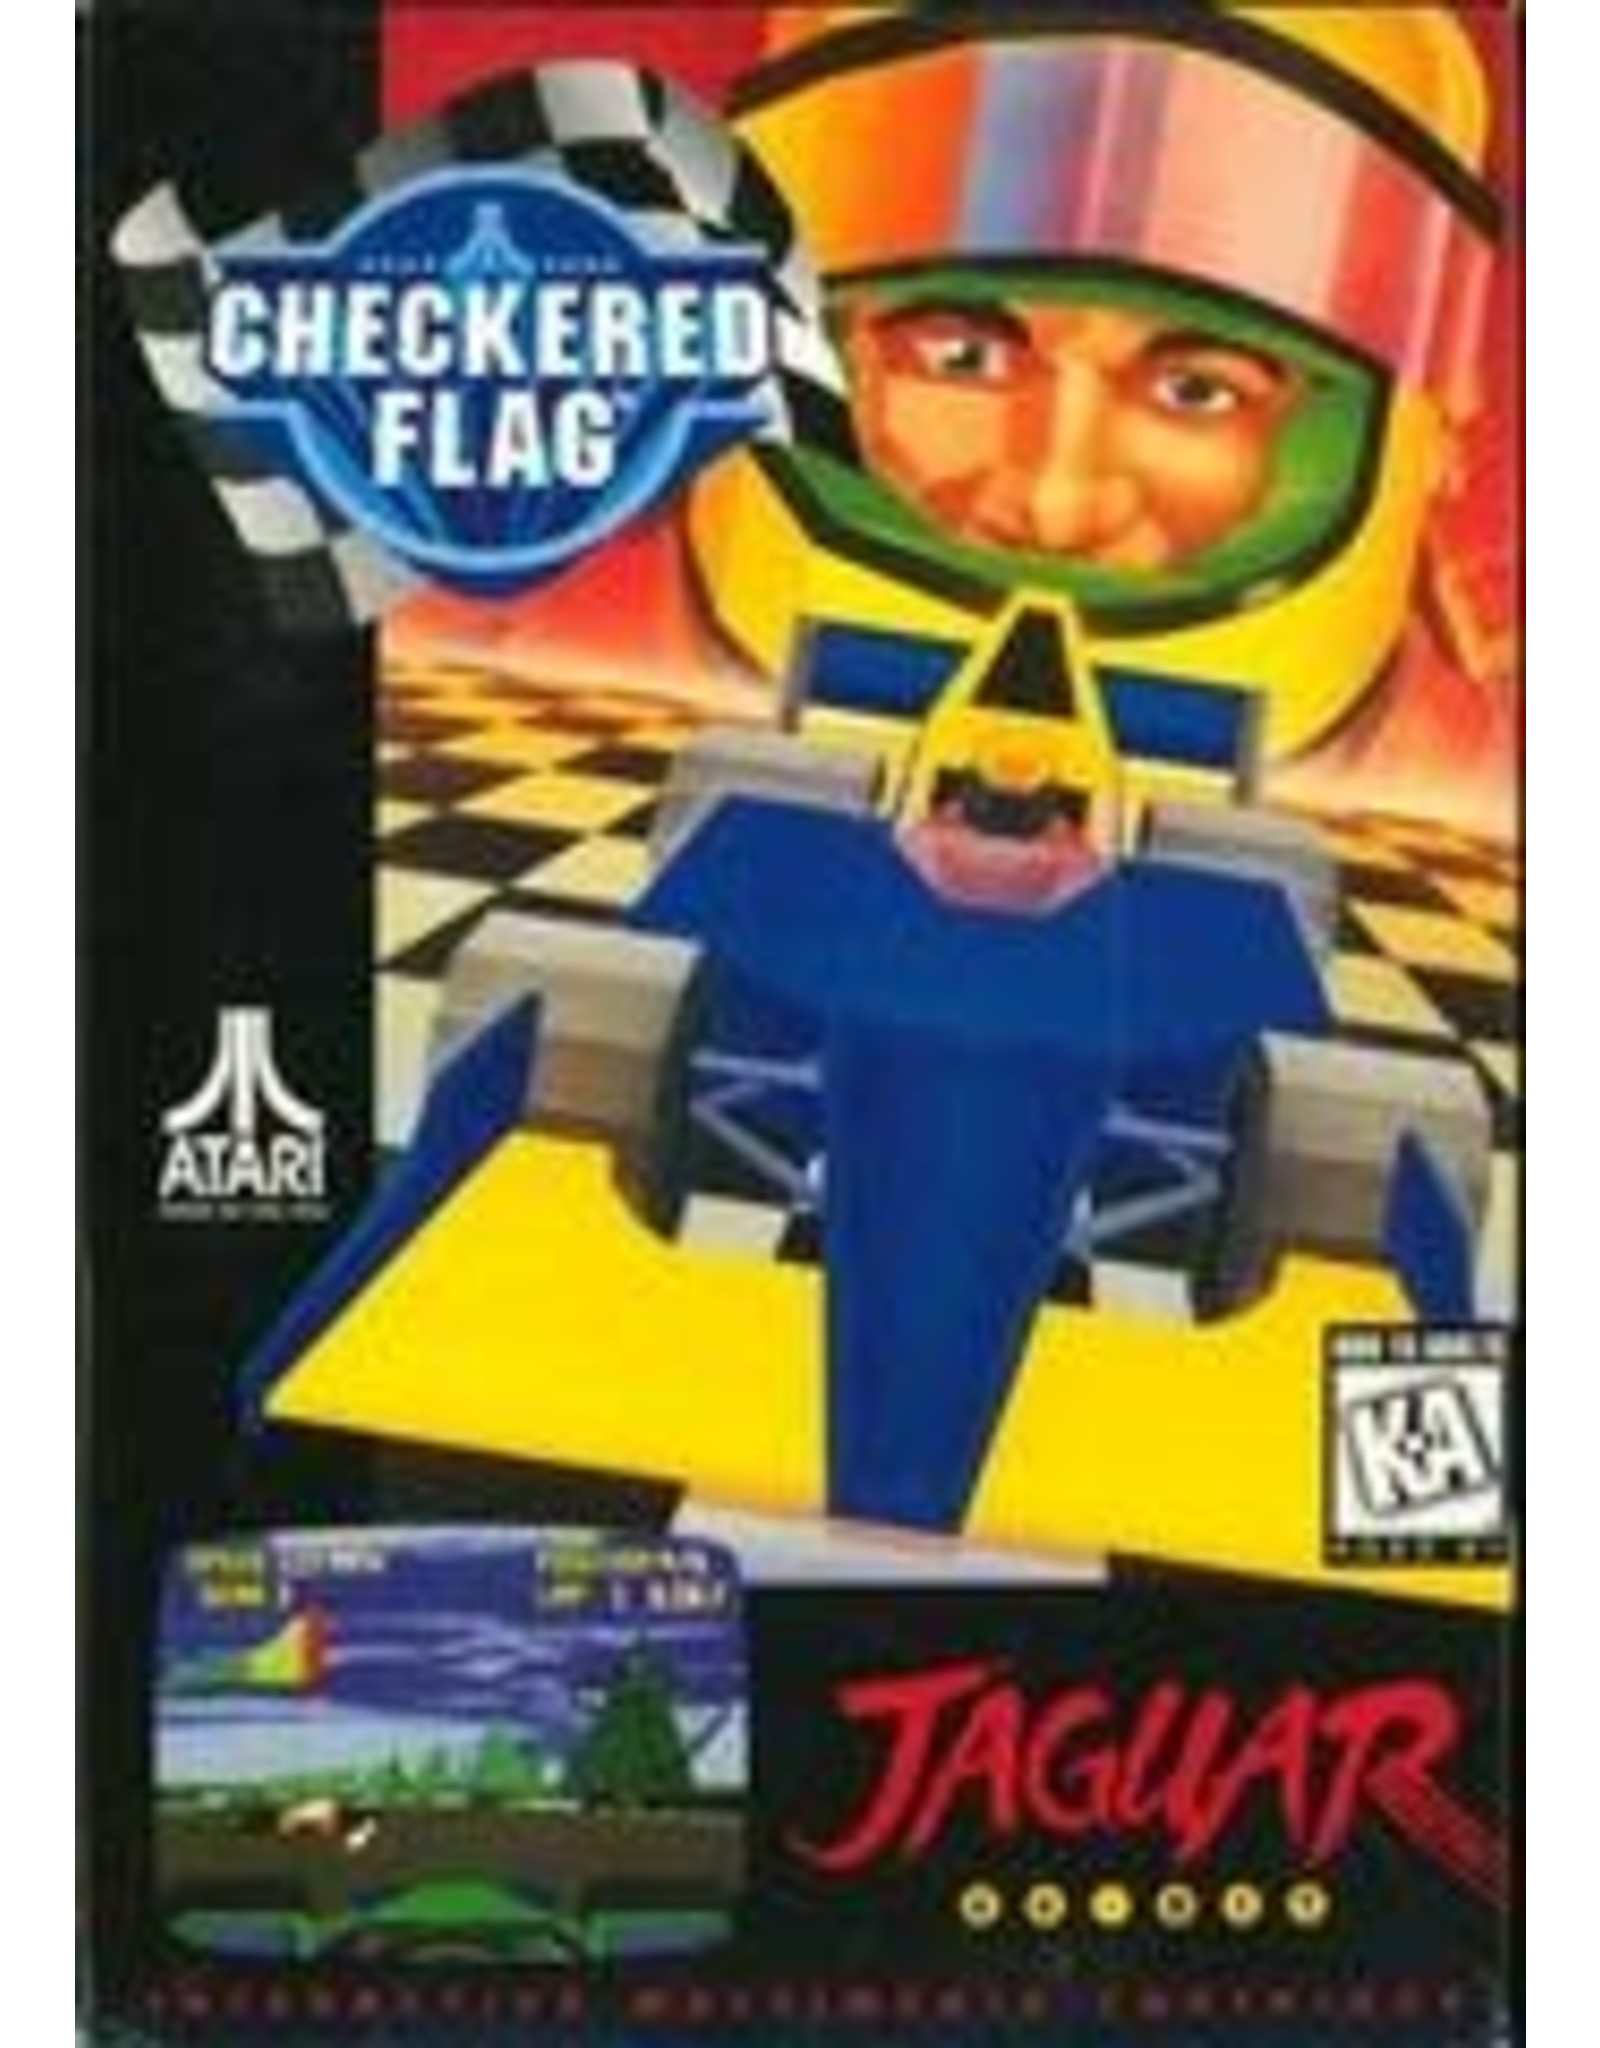 Jaguar Atari Jaguar Console *Includes Checkered Flag (CiB) and 2 Controllers)